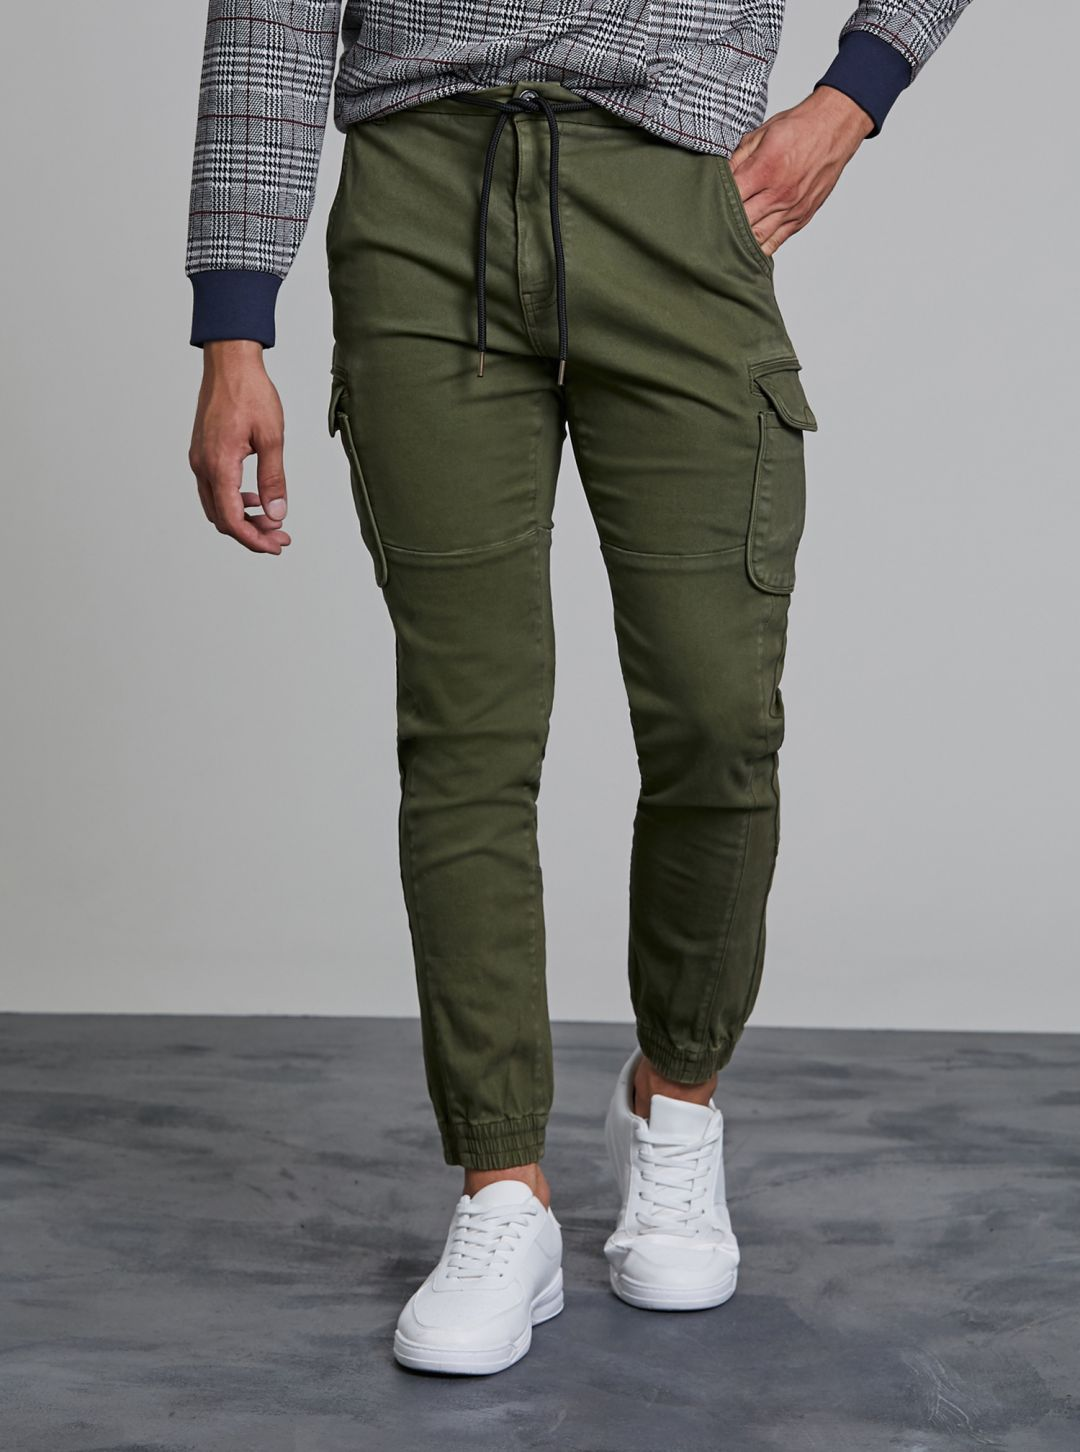 Pantaloni con tasconi